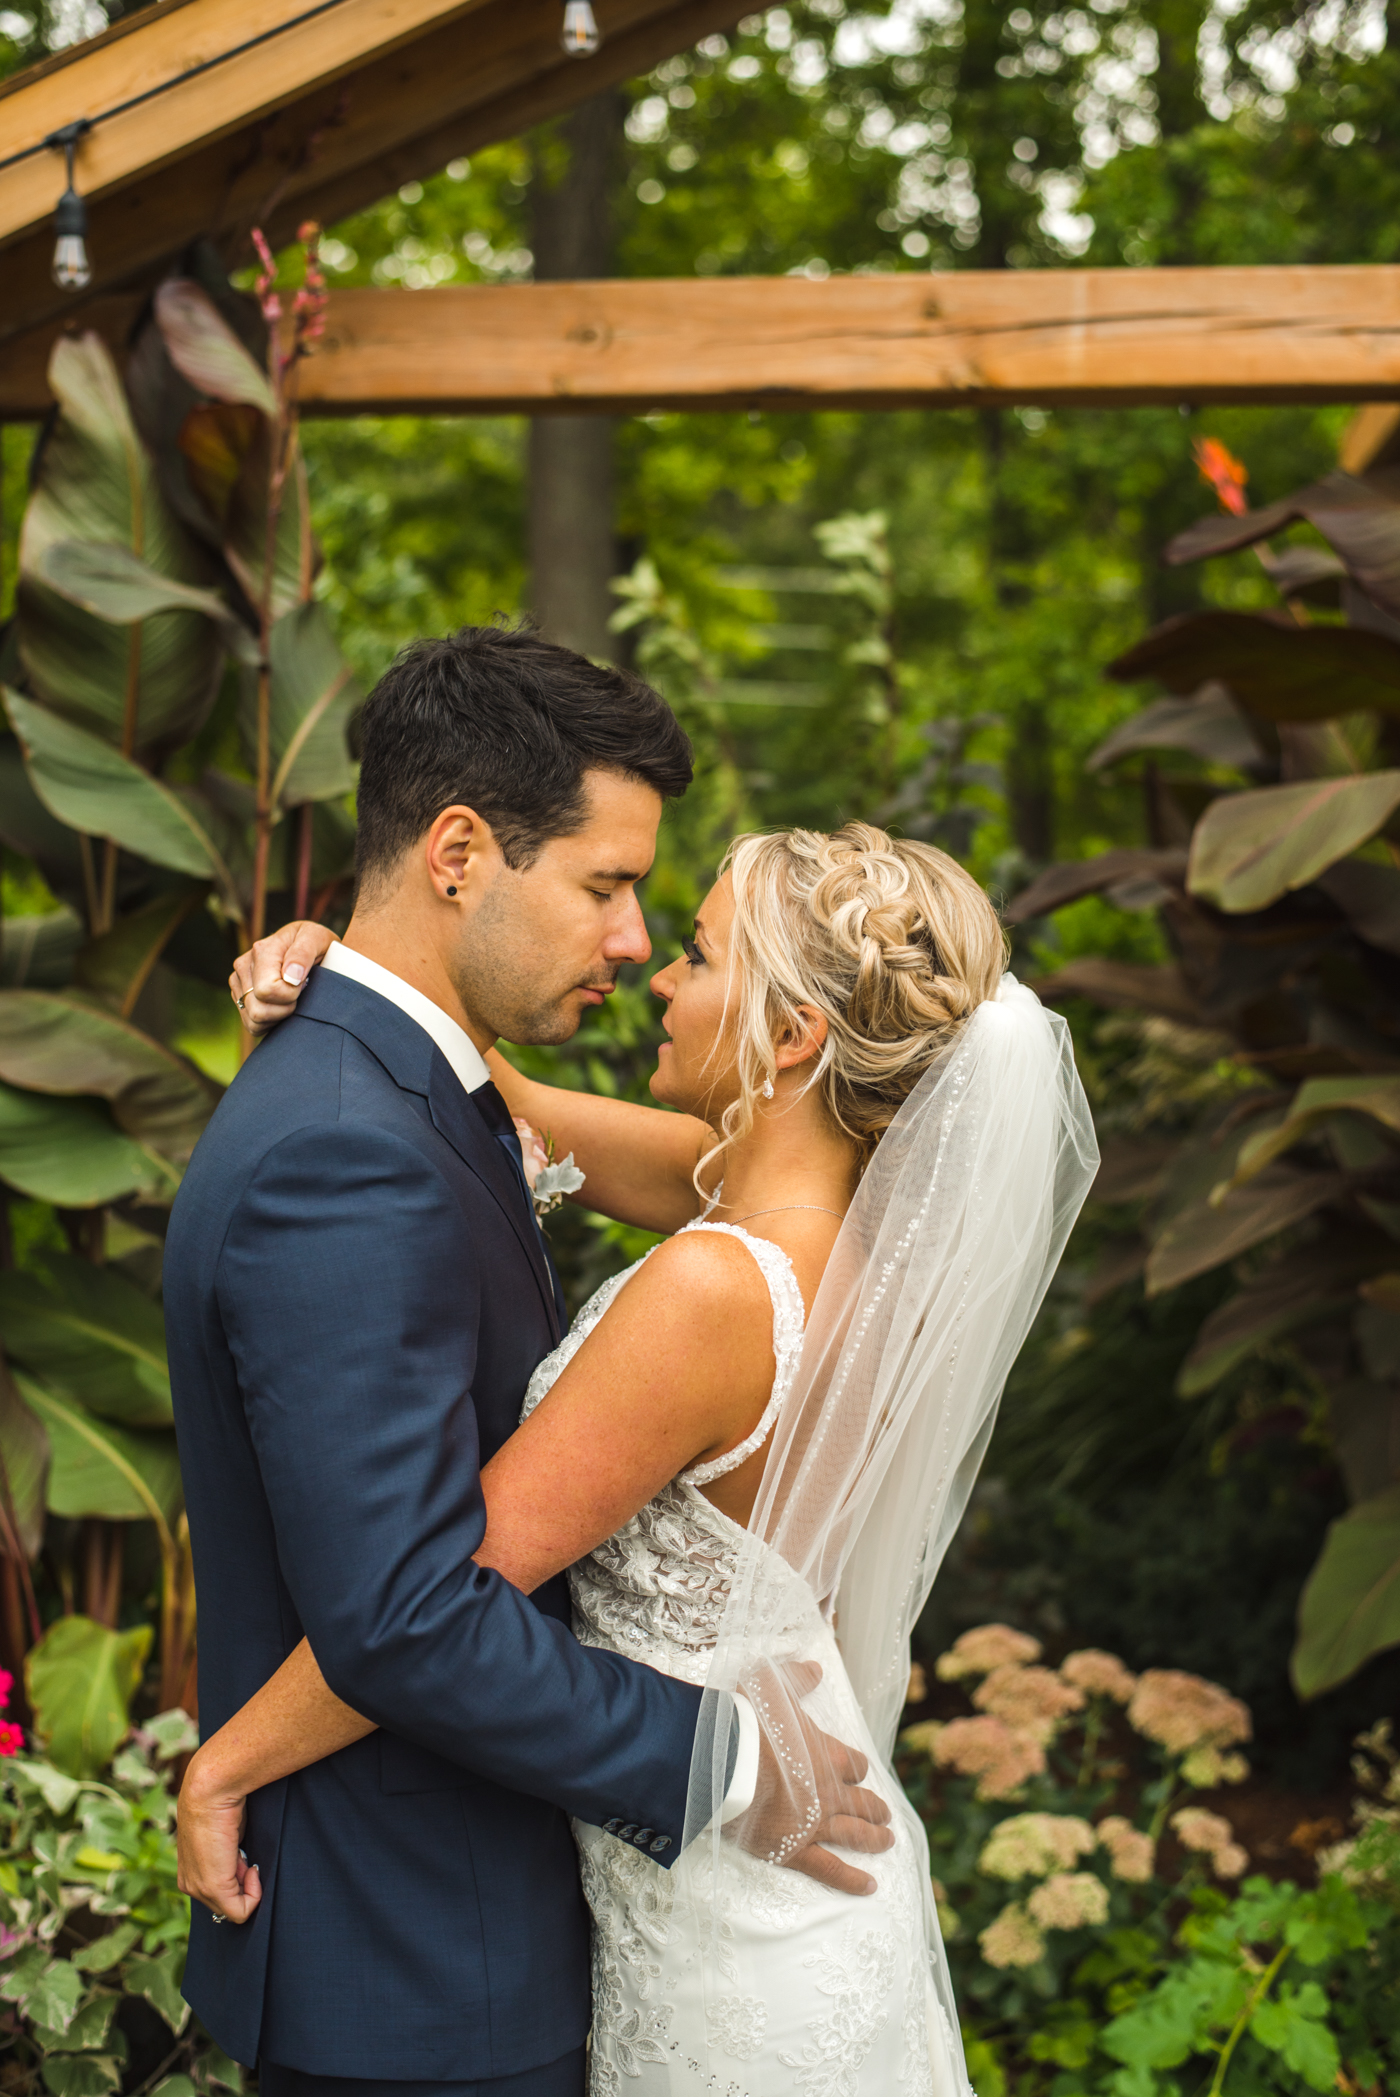 Eli & Michelle Wedding Hamilton St Catharines Niagara Ontario Club Roma Outdoor September Summer Aidan Hennebry of Hush Hush Photography & Film-21.jpg